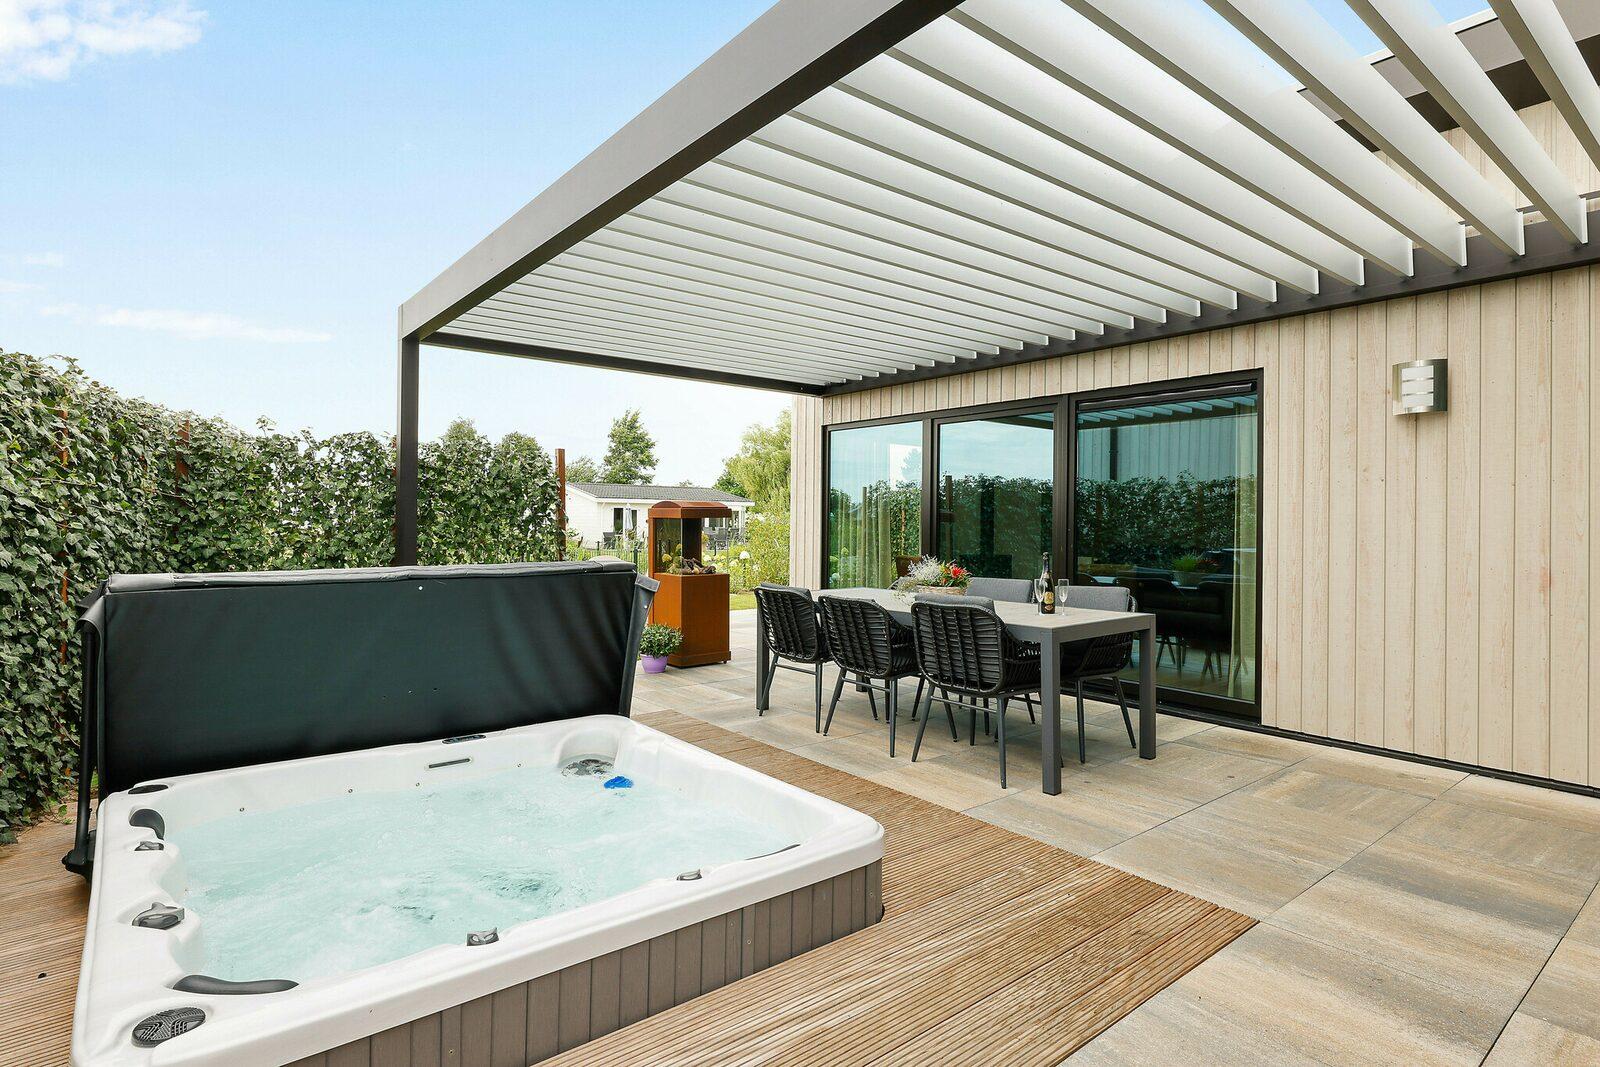 Wellness villa for 6 persons, 3 bedrooms